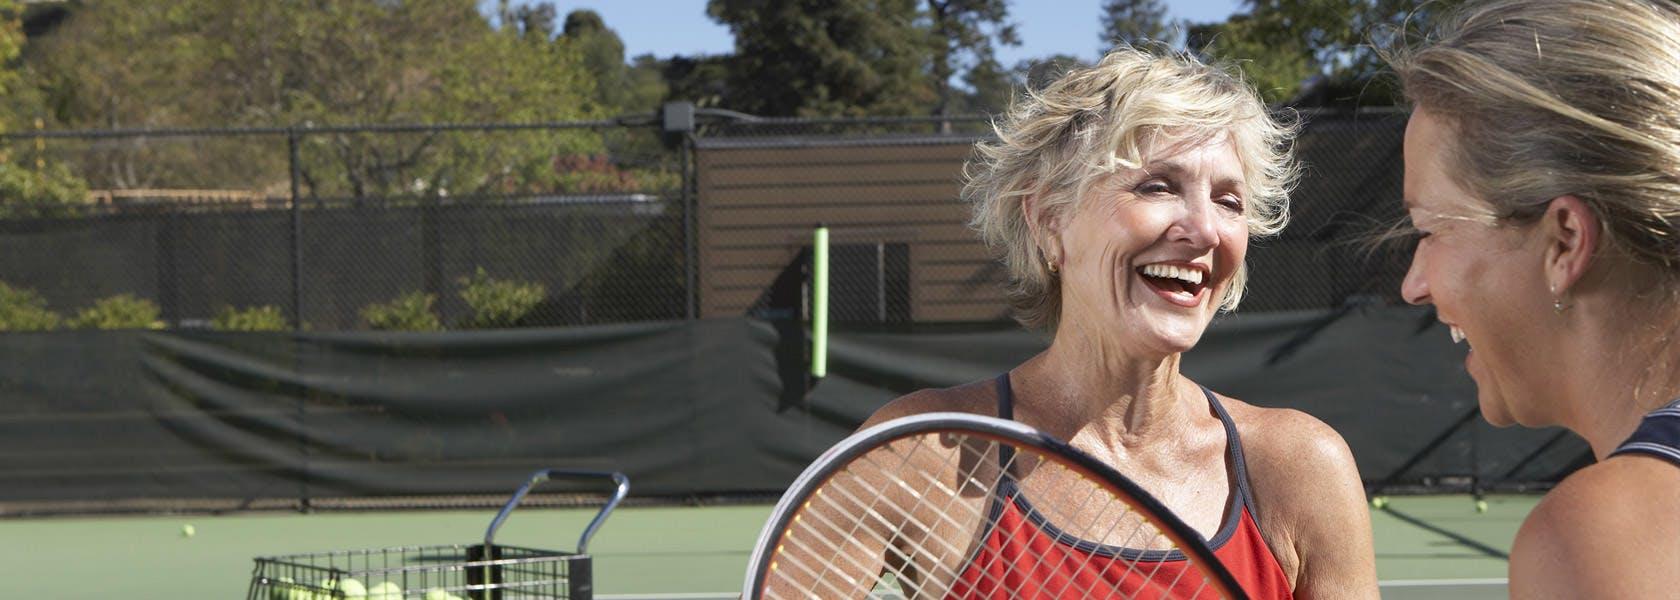 Women talking over a tennis game